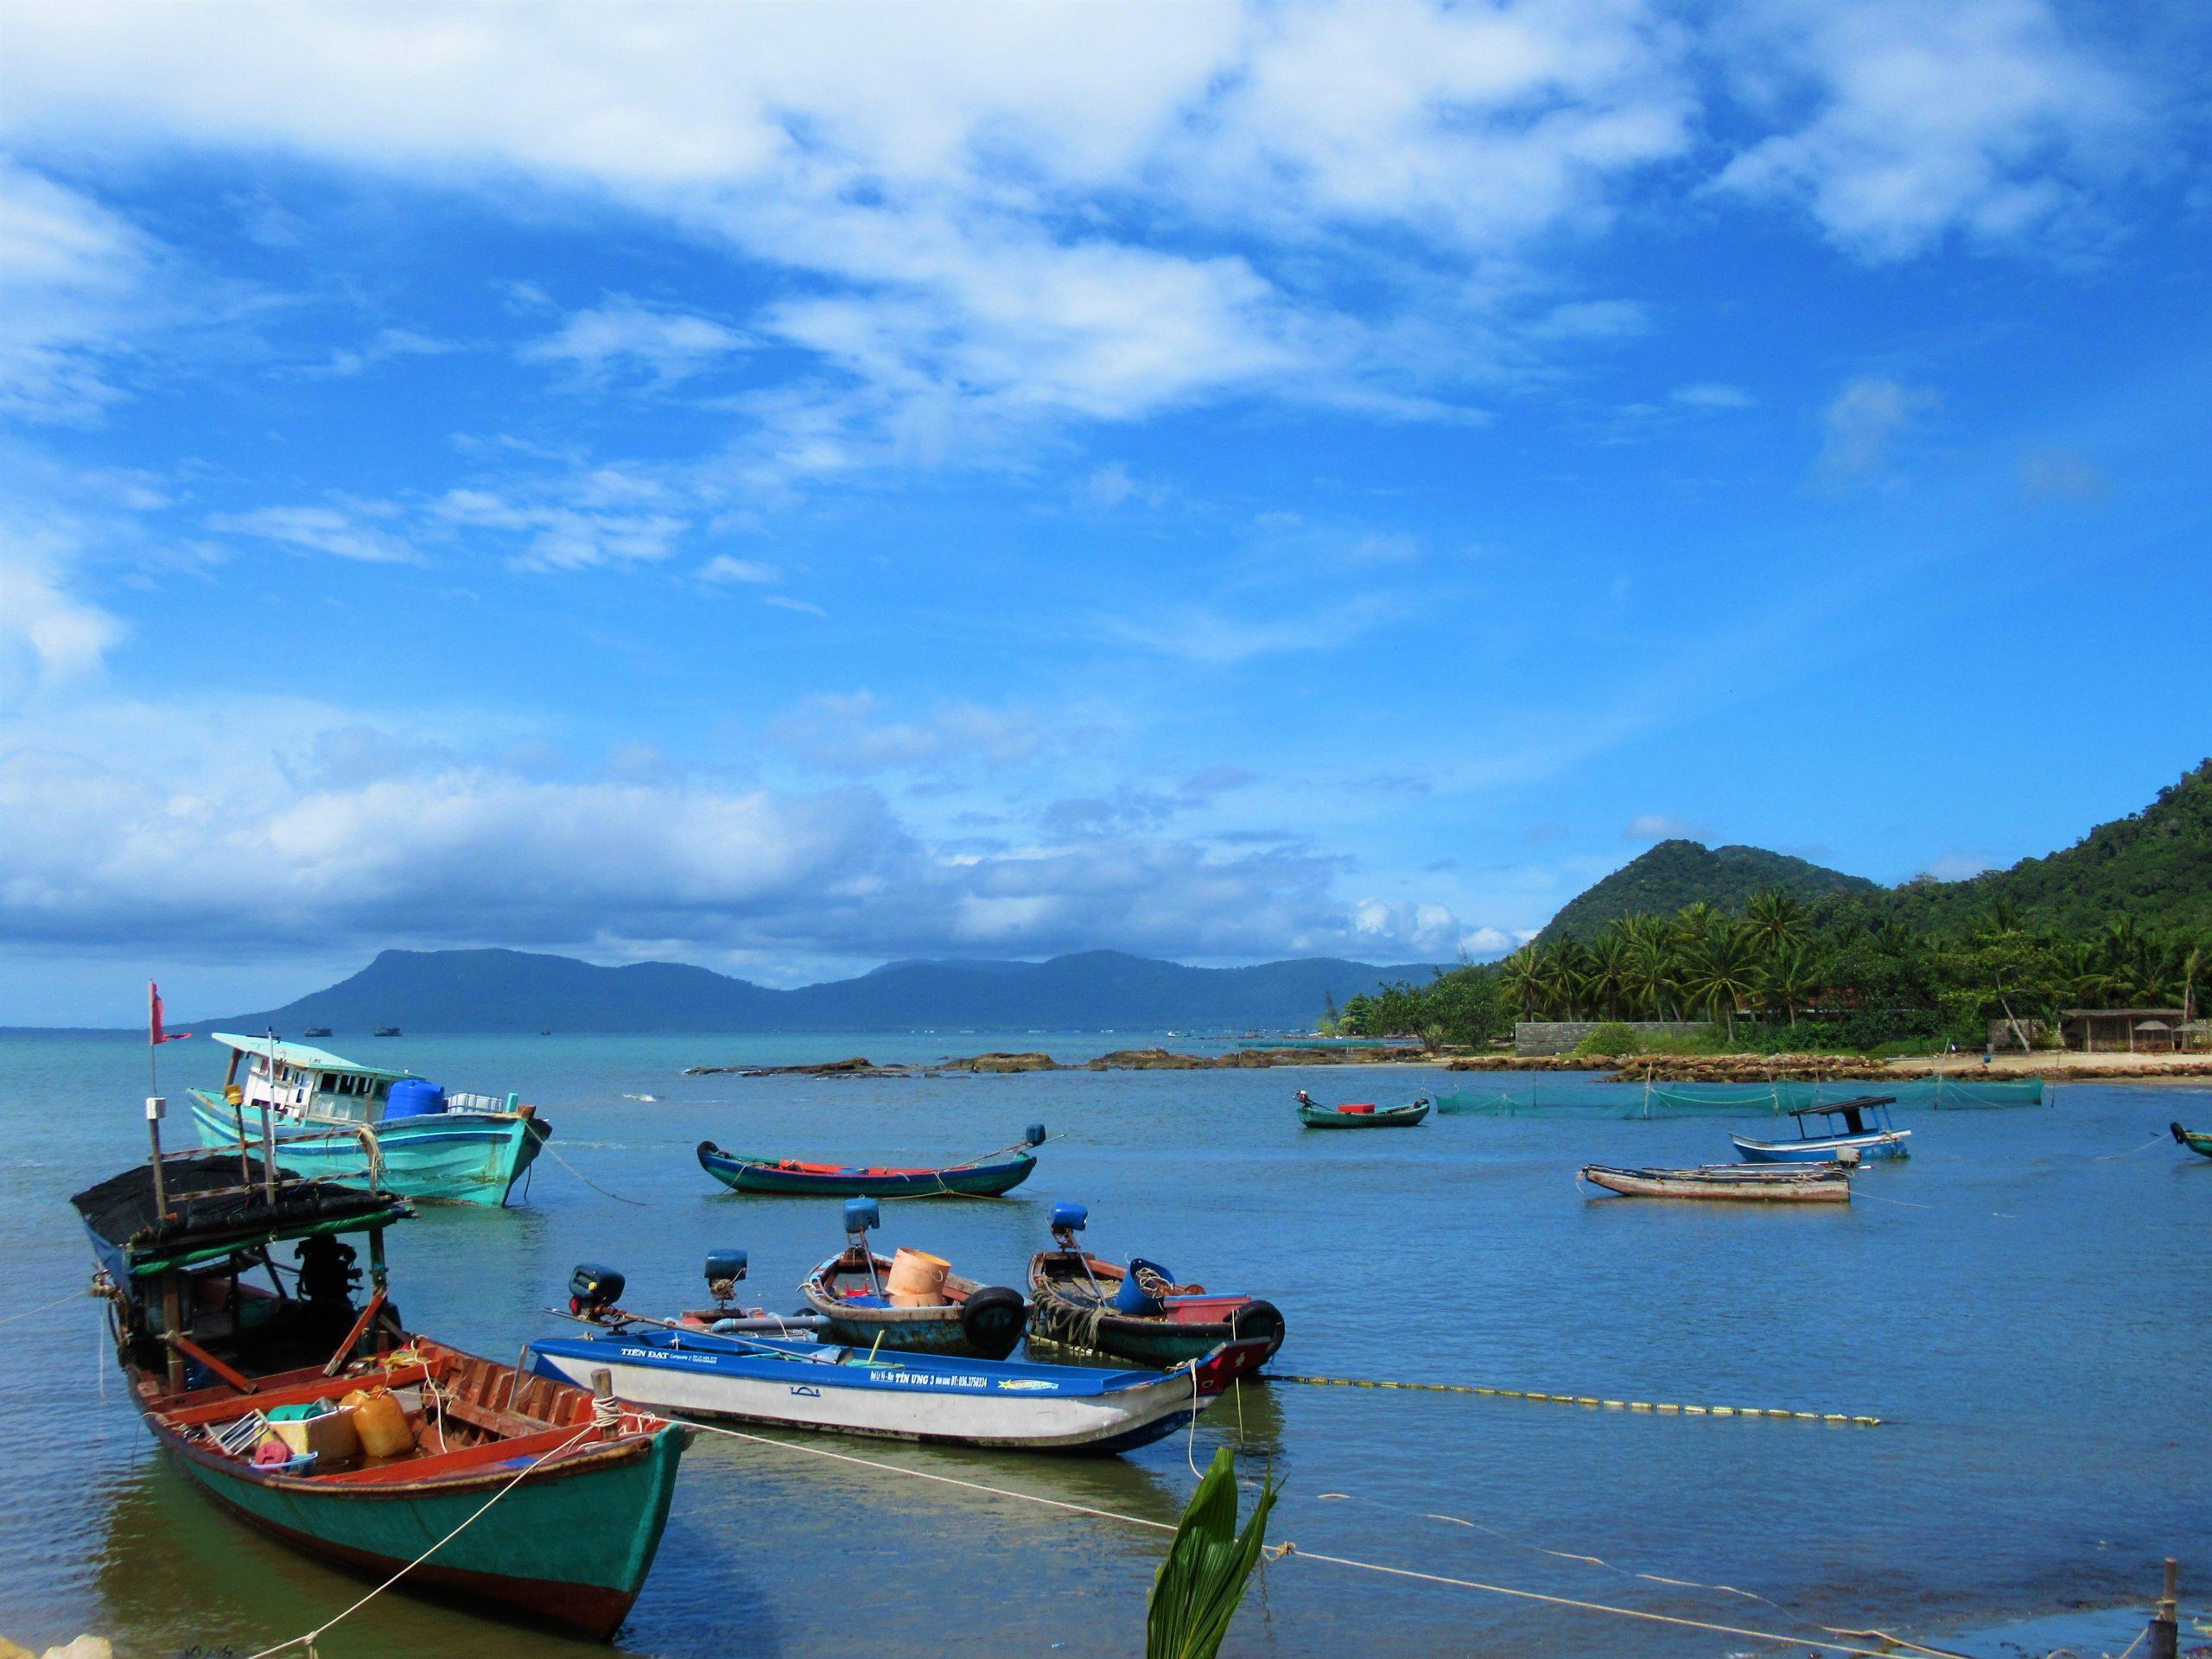 Bay at Gold Coast Resort, Phu Quoc Island, Vietnam